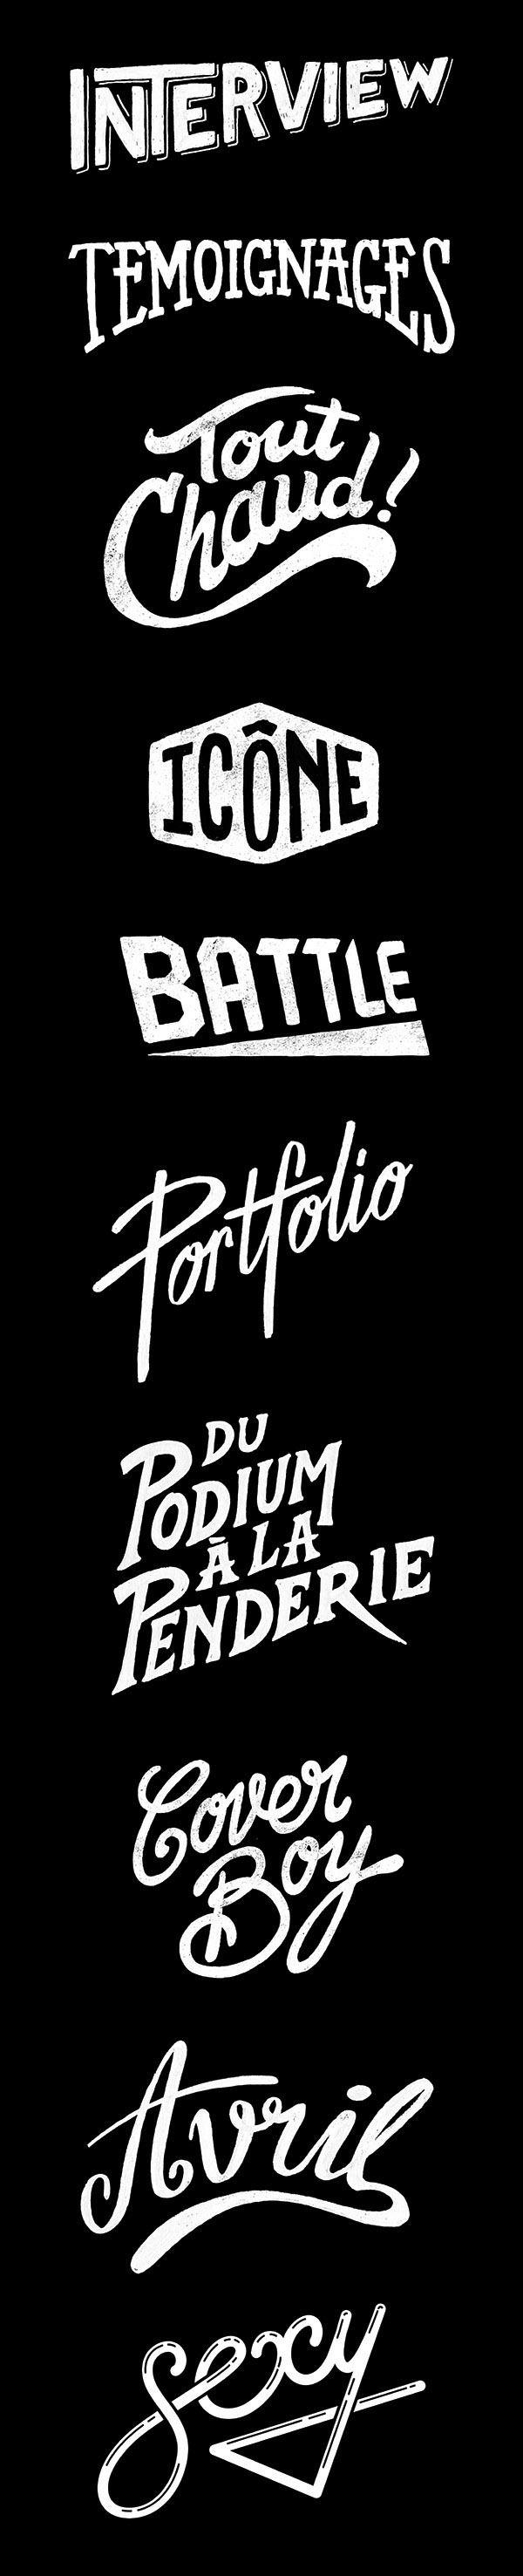 Hand Lettering type illustration graphic design